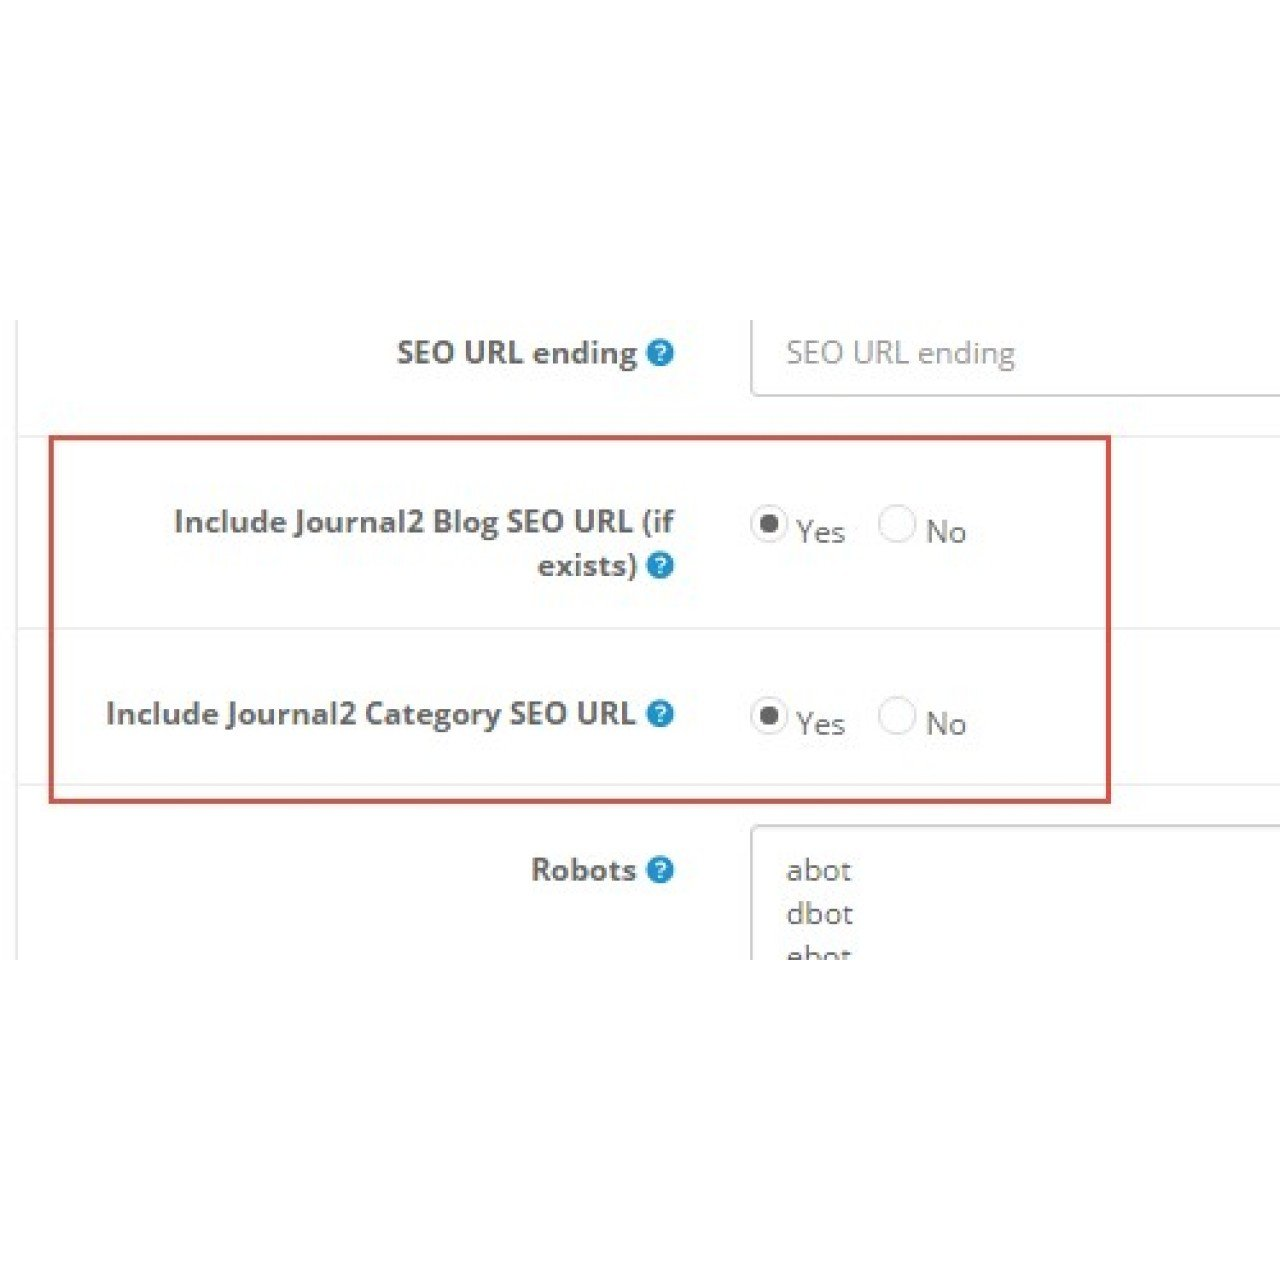 SeoPro Fix for Journal2 Blog